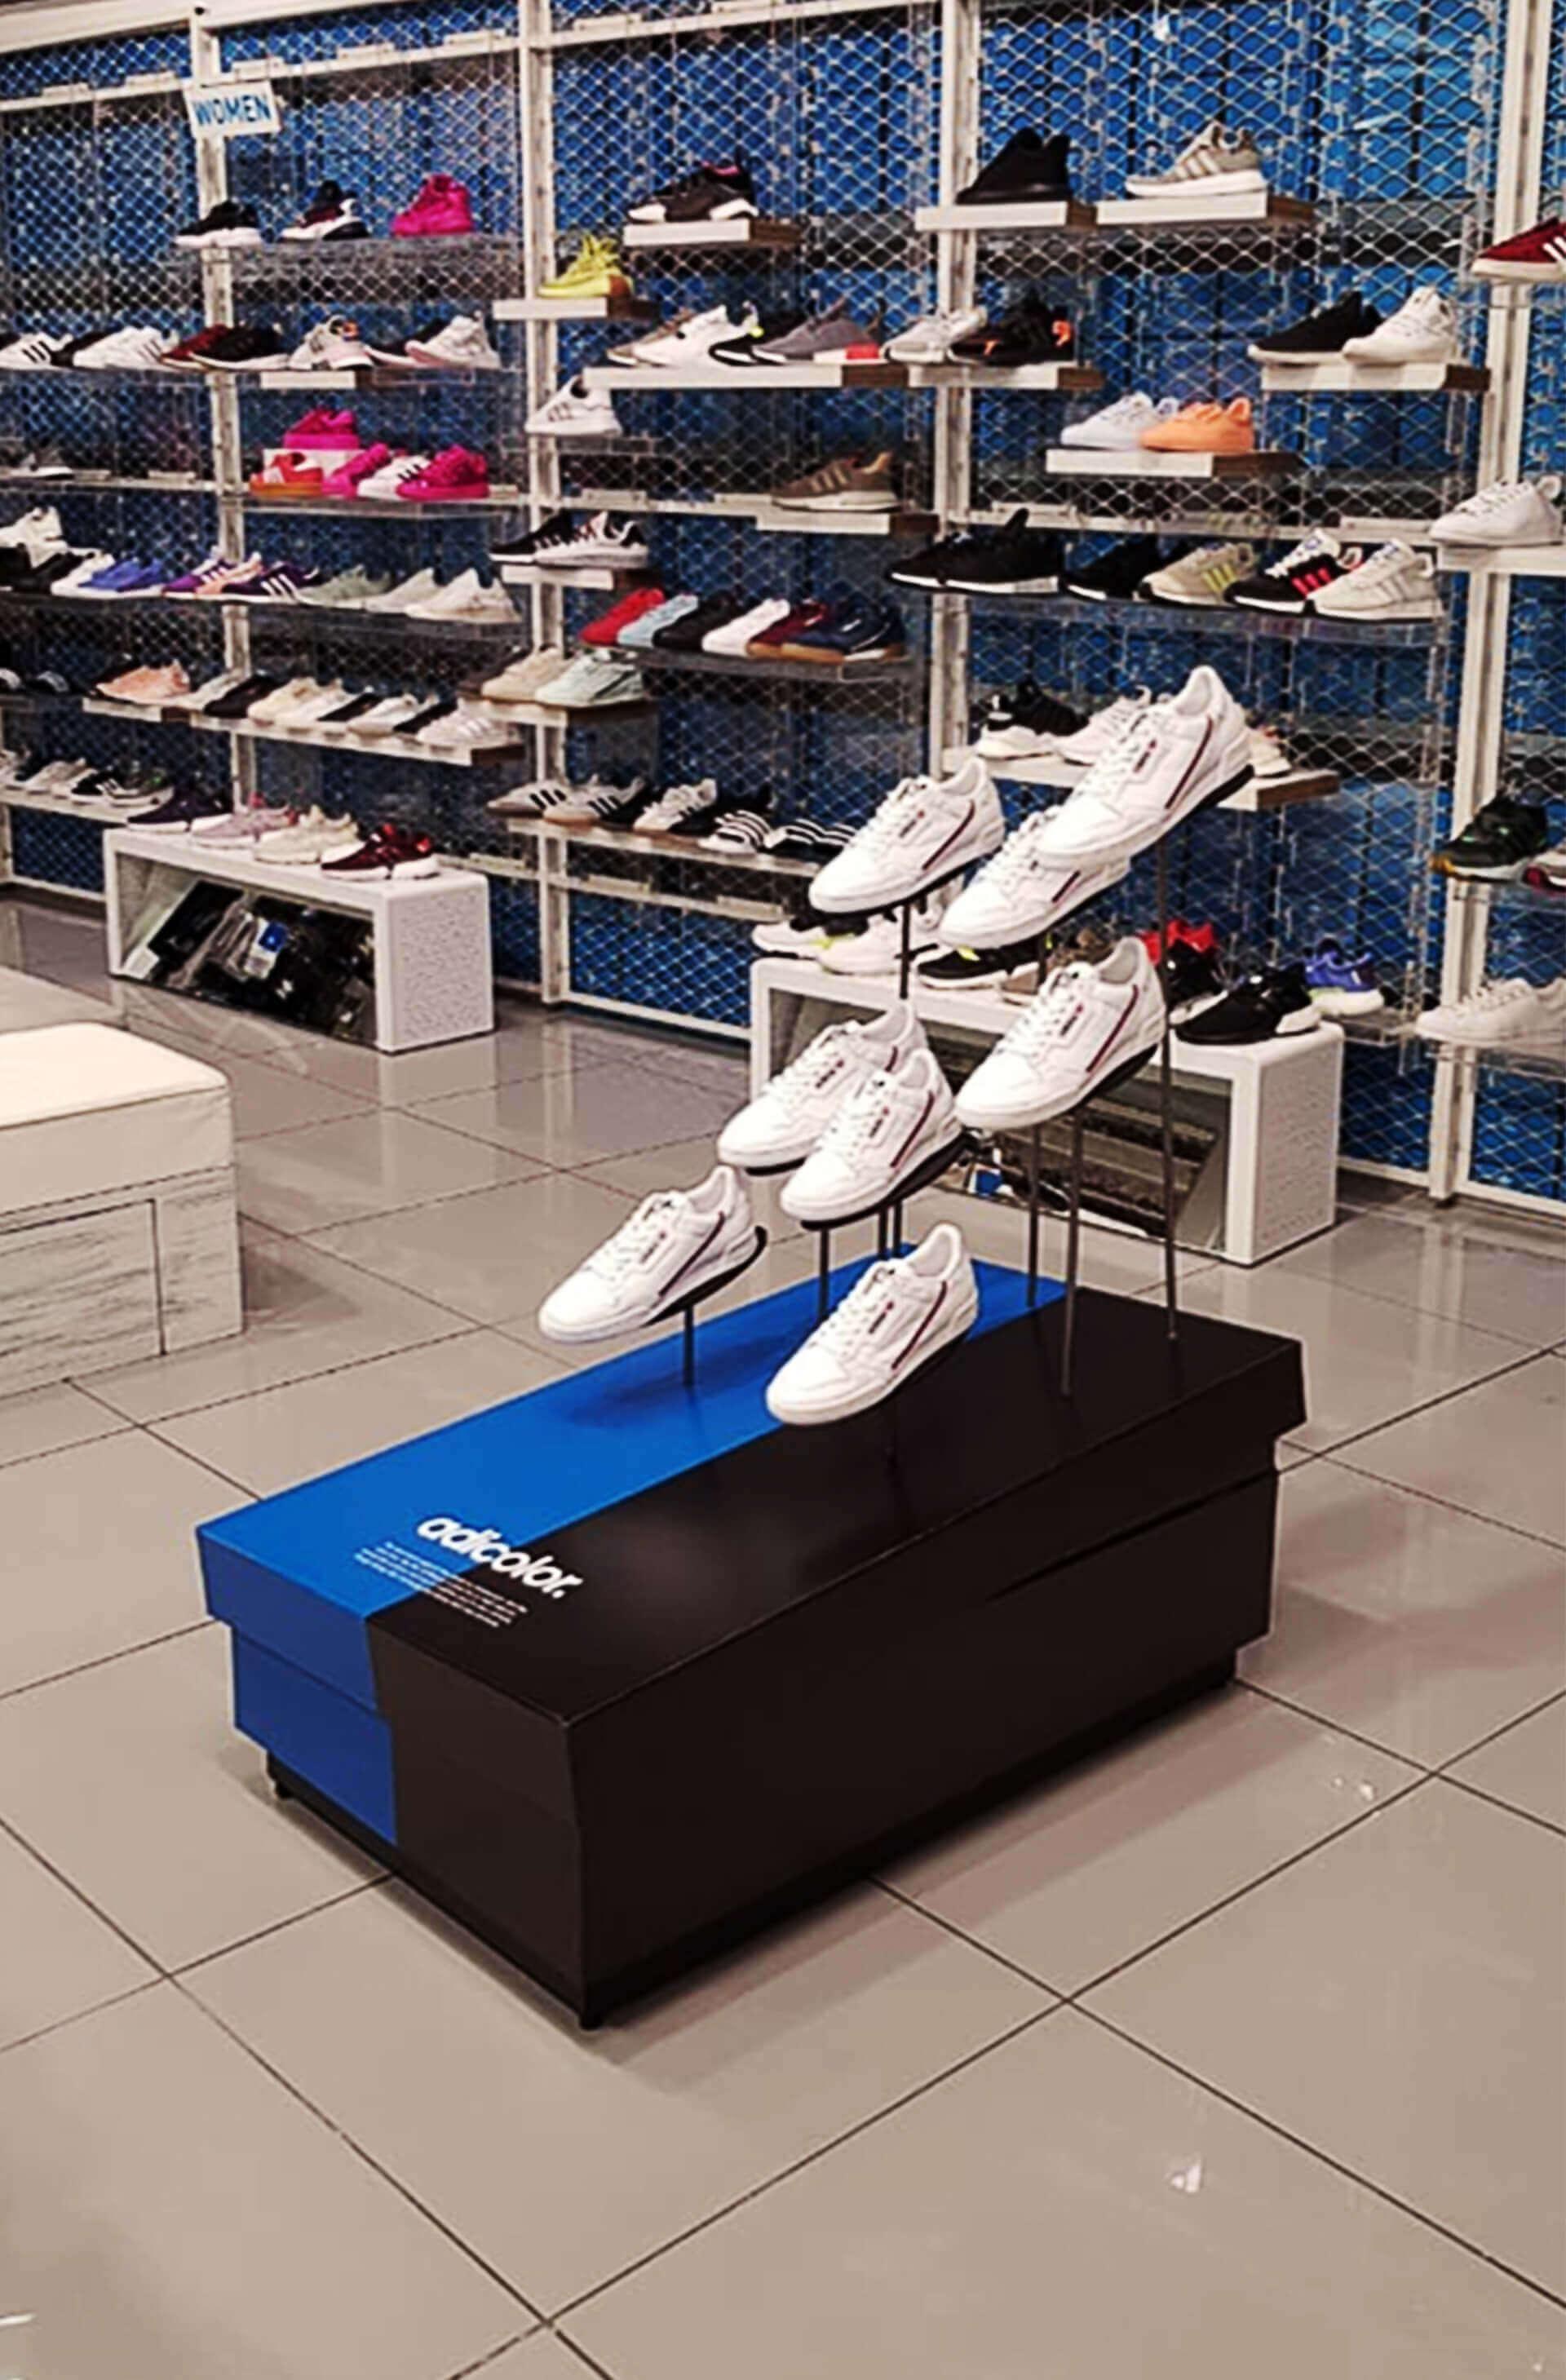 Adidas - Adi Colour -Main Shoe Box Stand Side